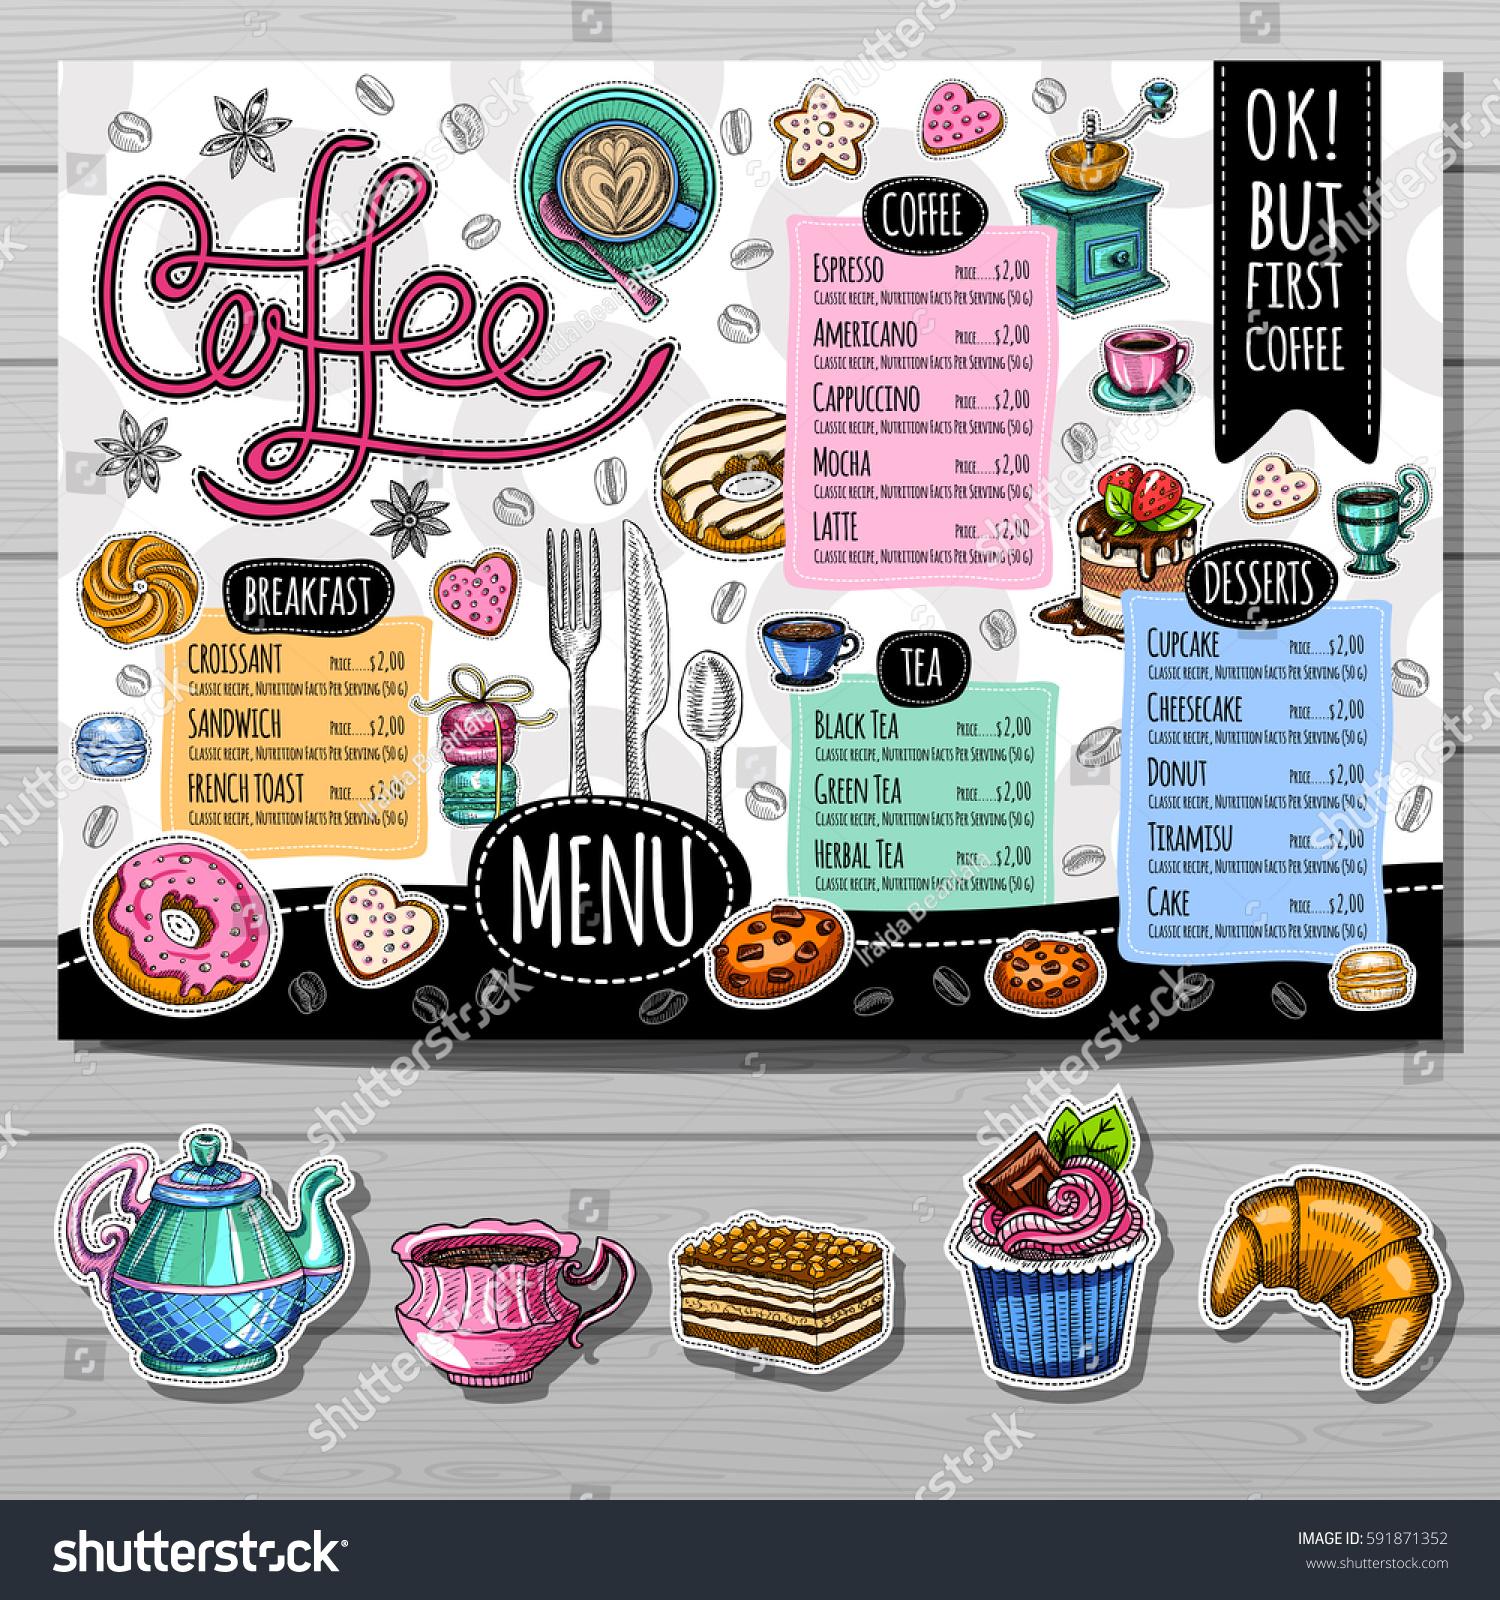 Coffee Shop Menu Template Cafe Menu Stock Vector (Royalty Free ...